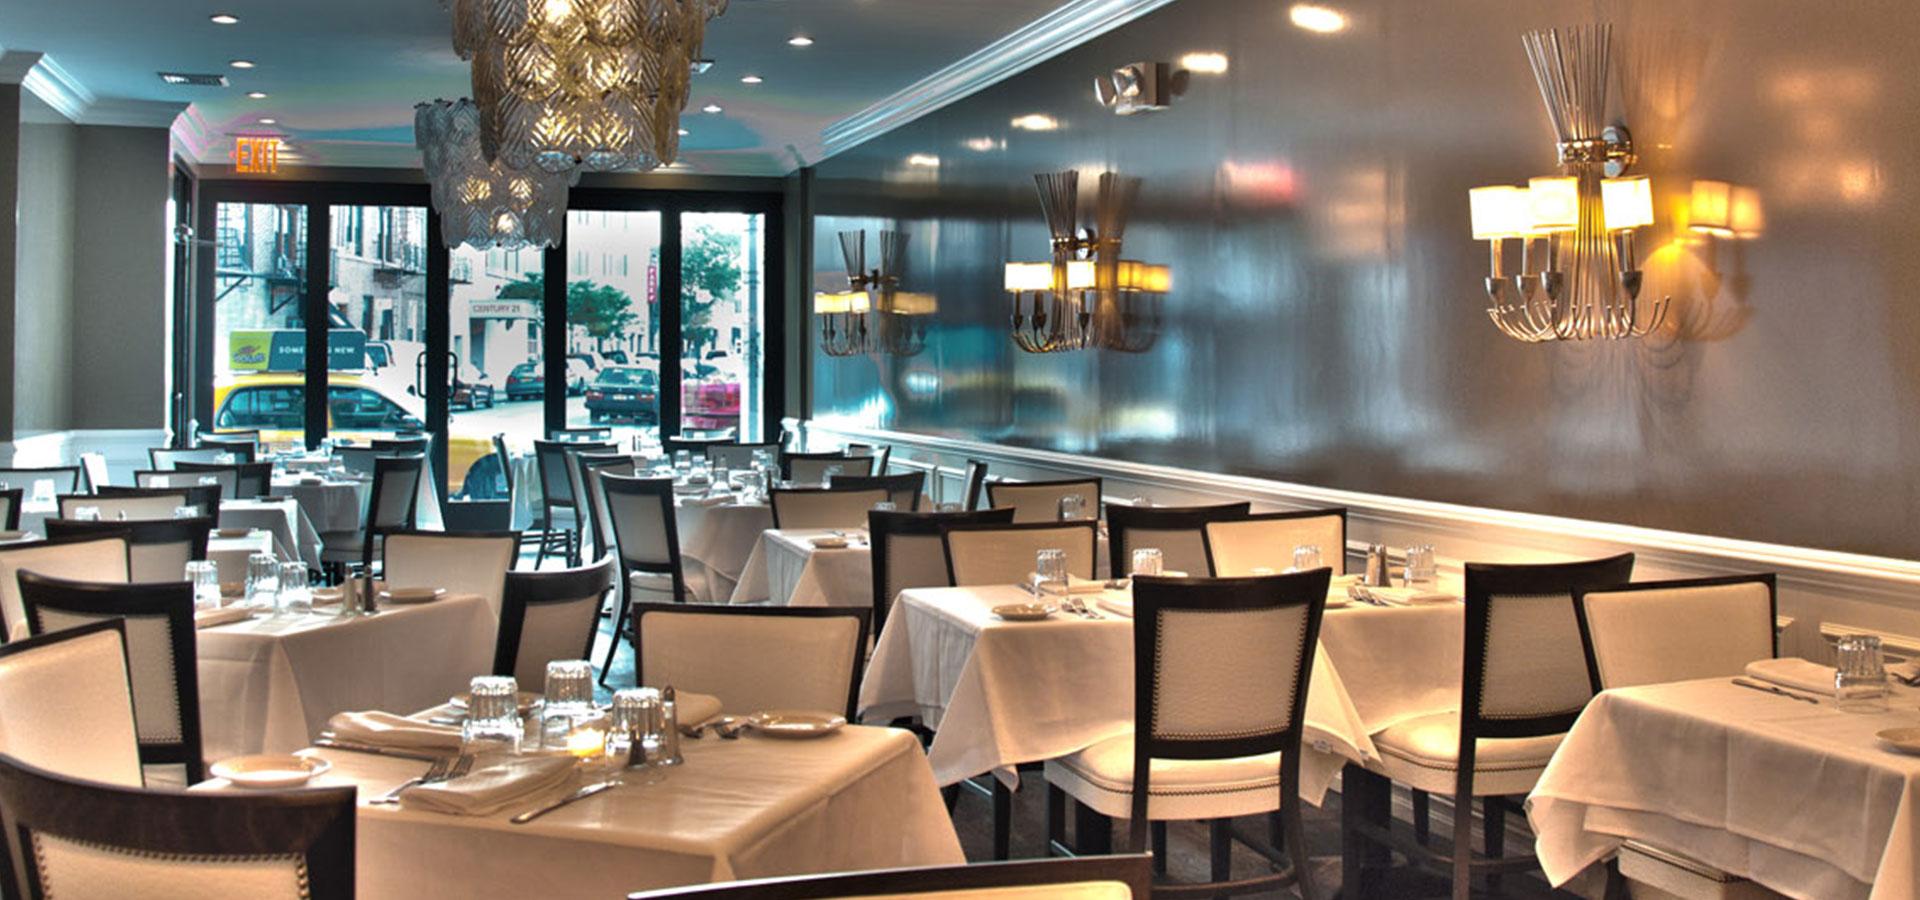 Trendiest Italian Restaurant